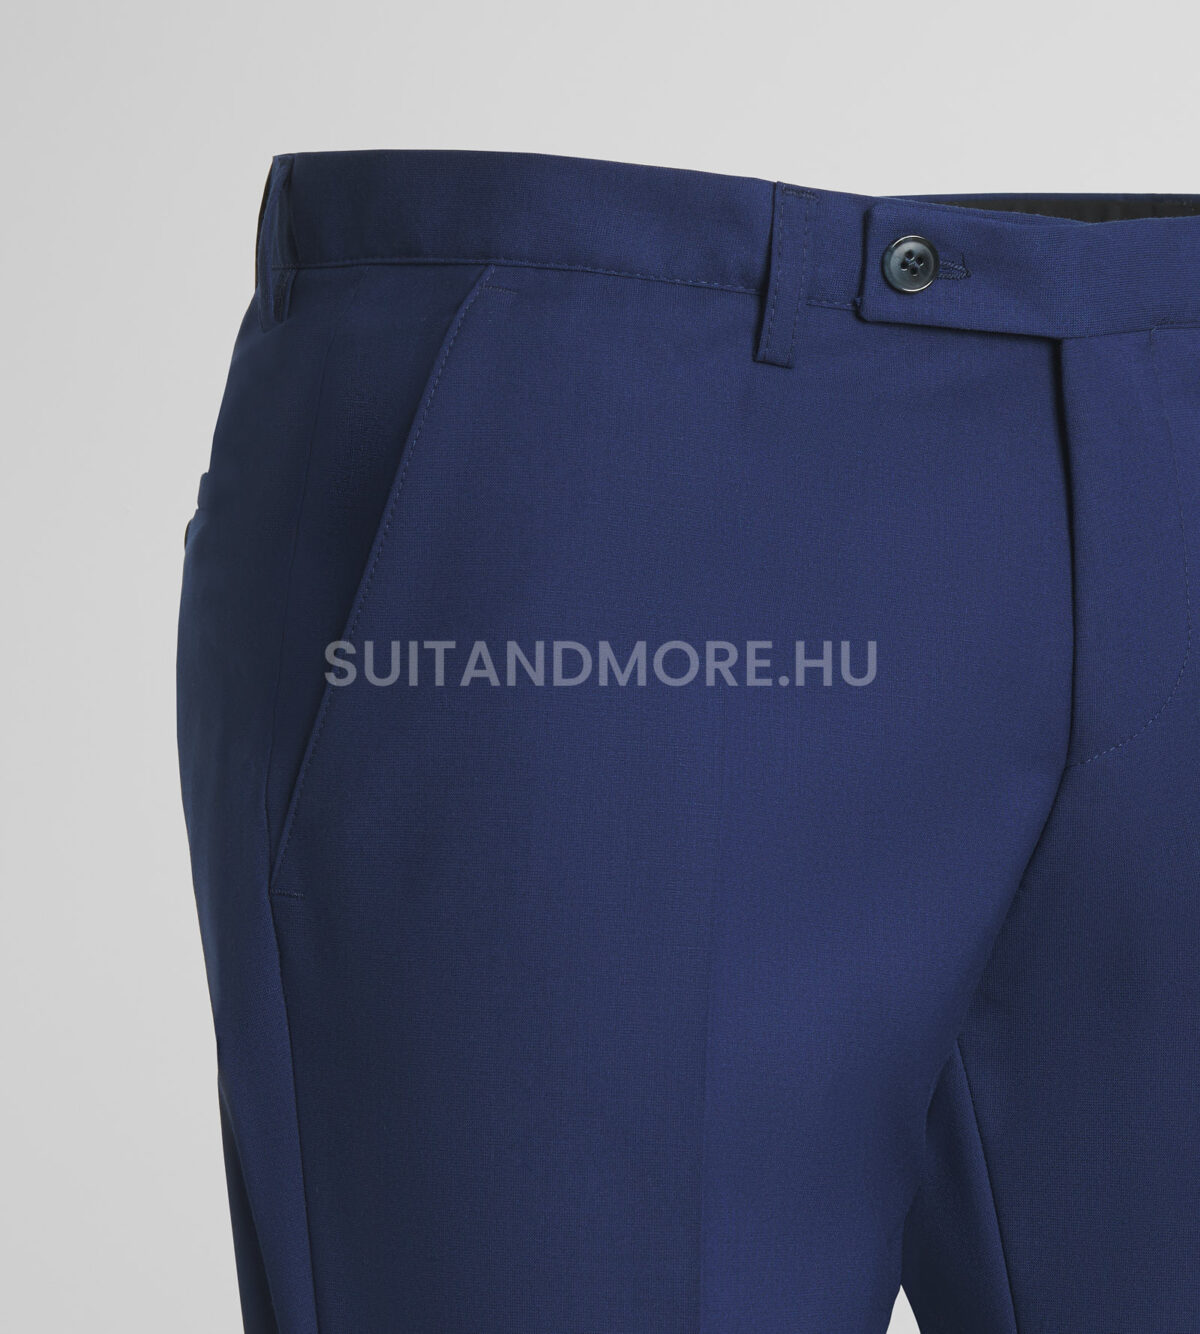 digel-move-tintakek-extra-slim-fit-oltony-nate-nanno-99713-24